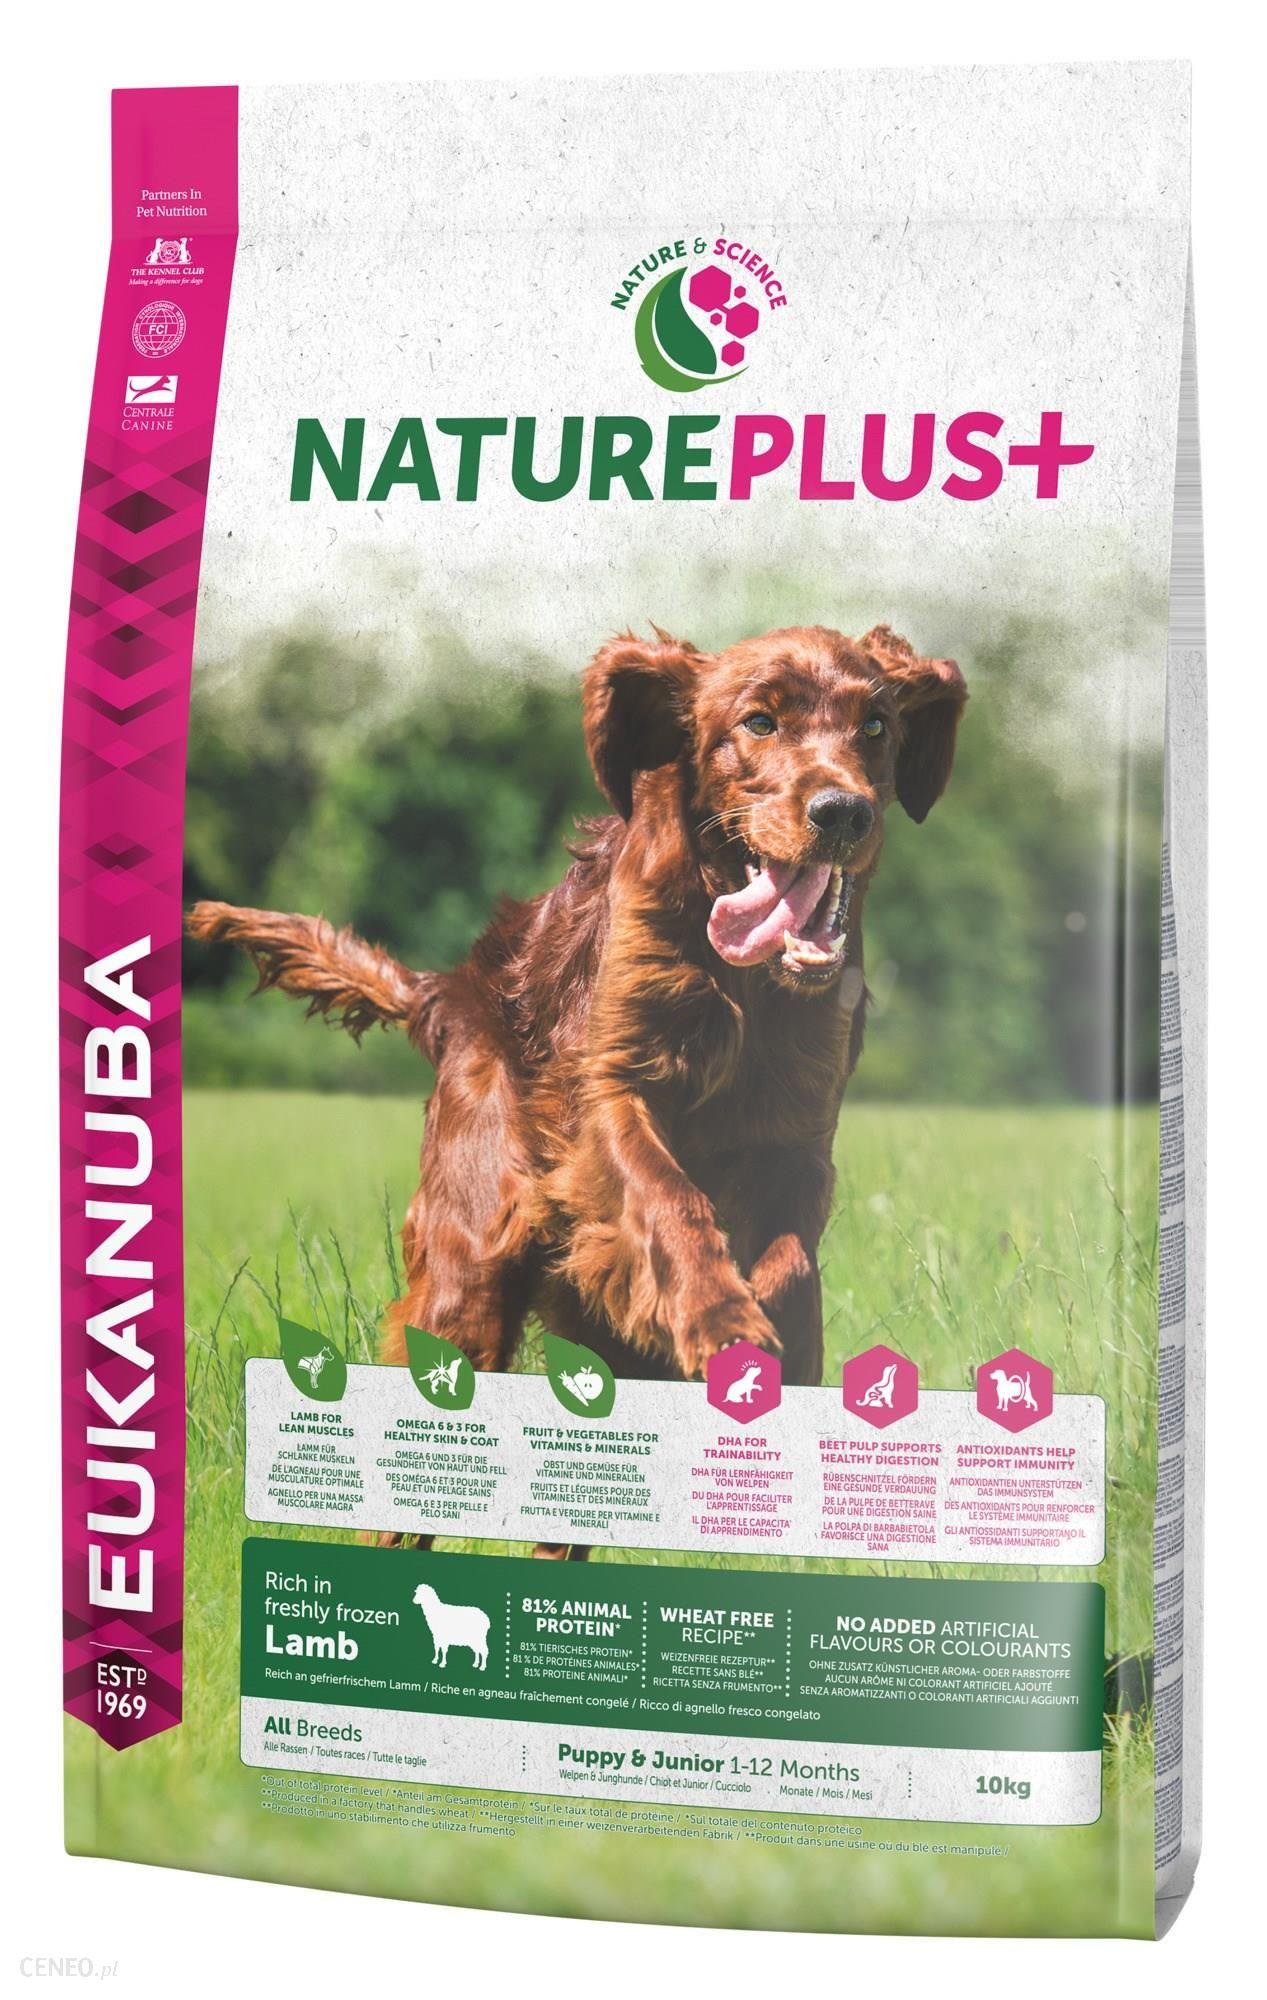 Eukanuba NaturePlus+ Puppy & Junior bogata w świeżo mrożoną jagnięcinę 10kg